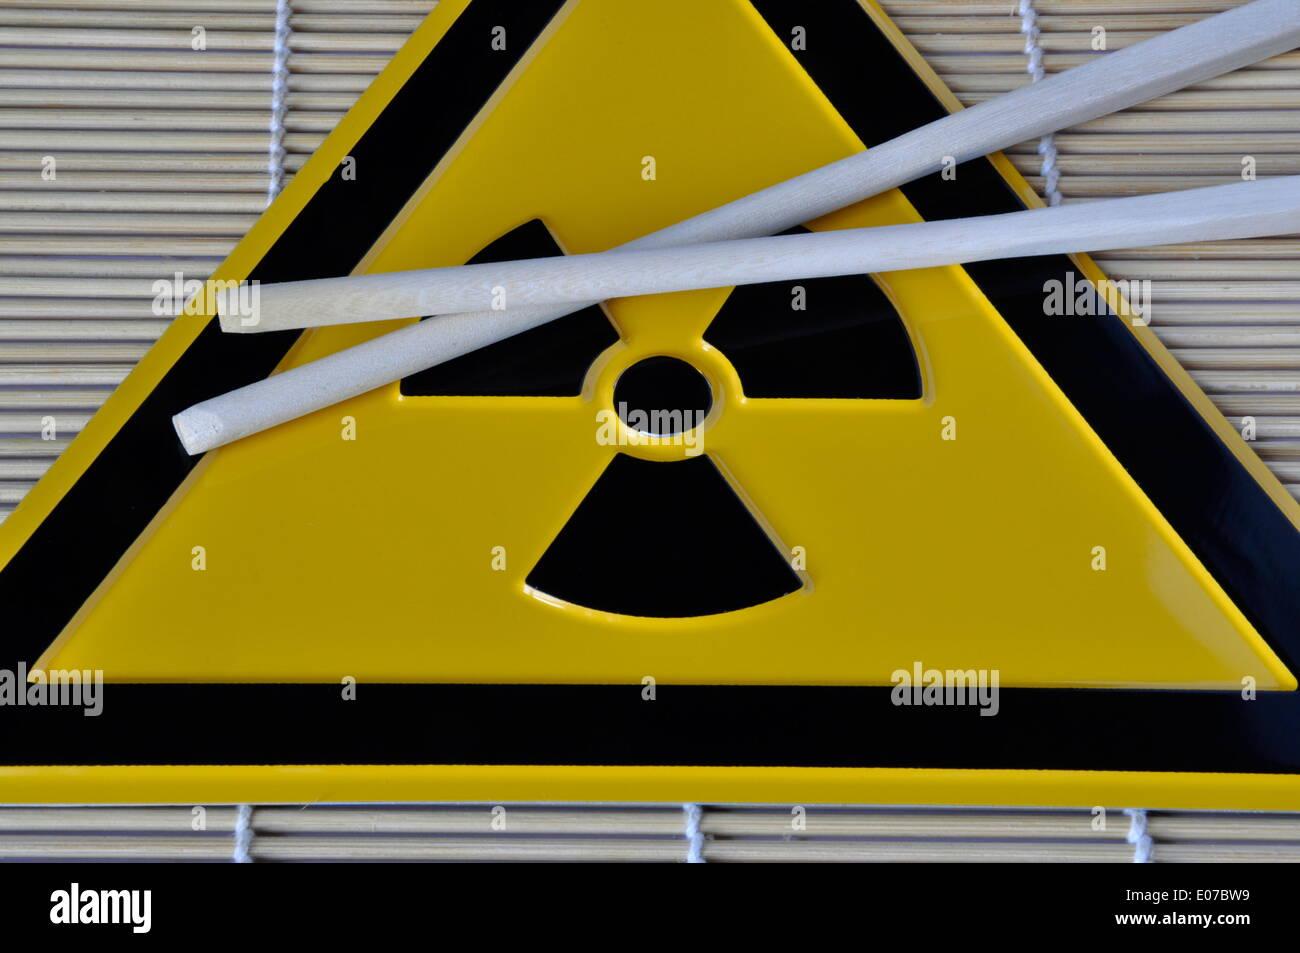 (ILLUSTRATION) Chopsticks lie on a radioactivity warning sign in Germany, 01 April 2011. Photo: Berliner Verlag/Steinach Stock Photo